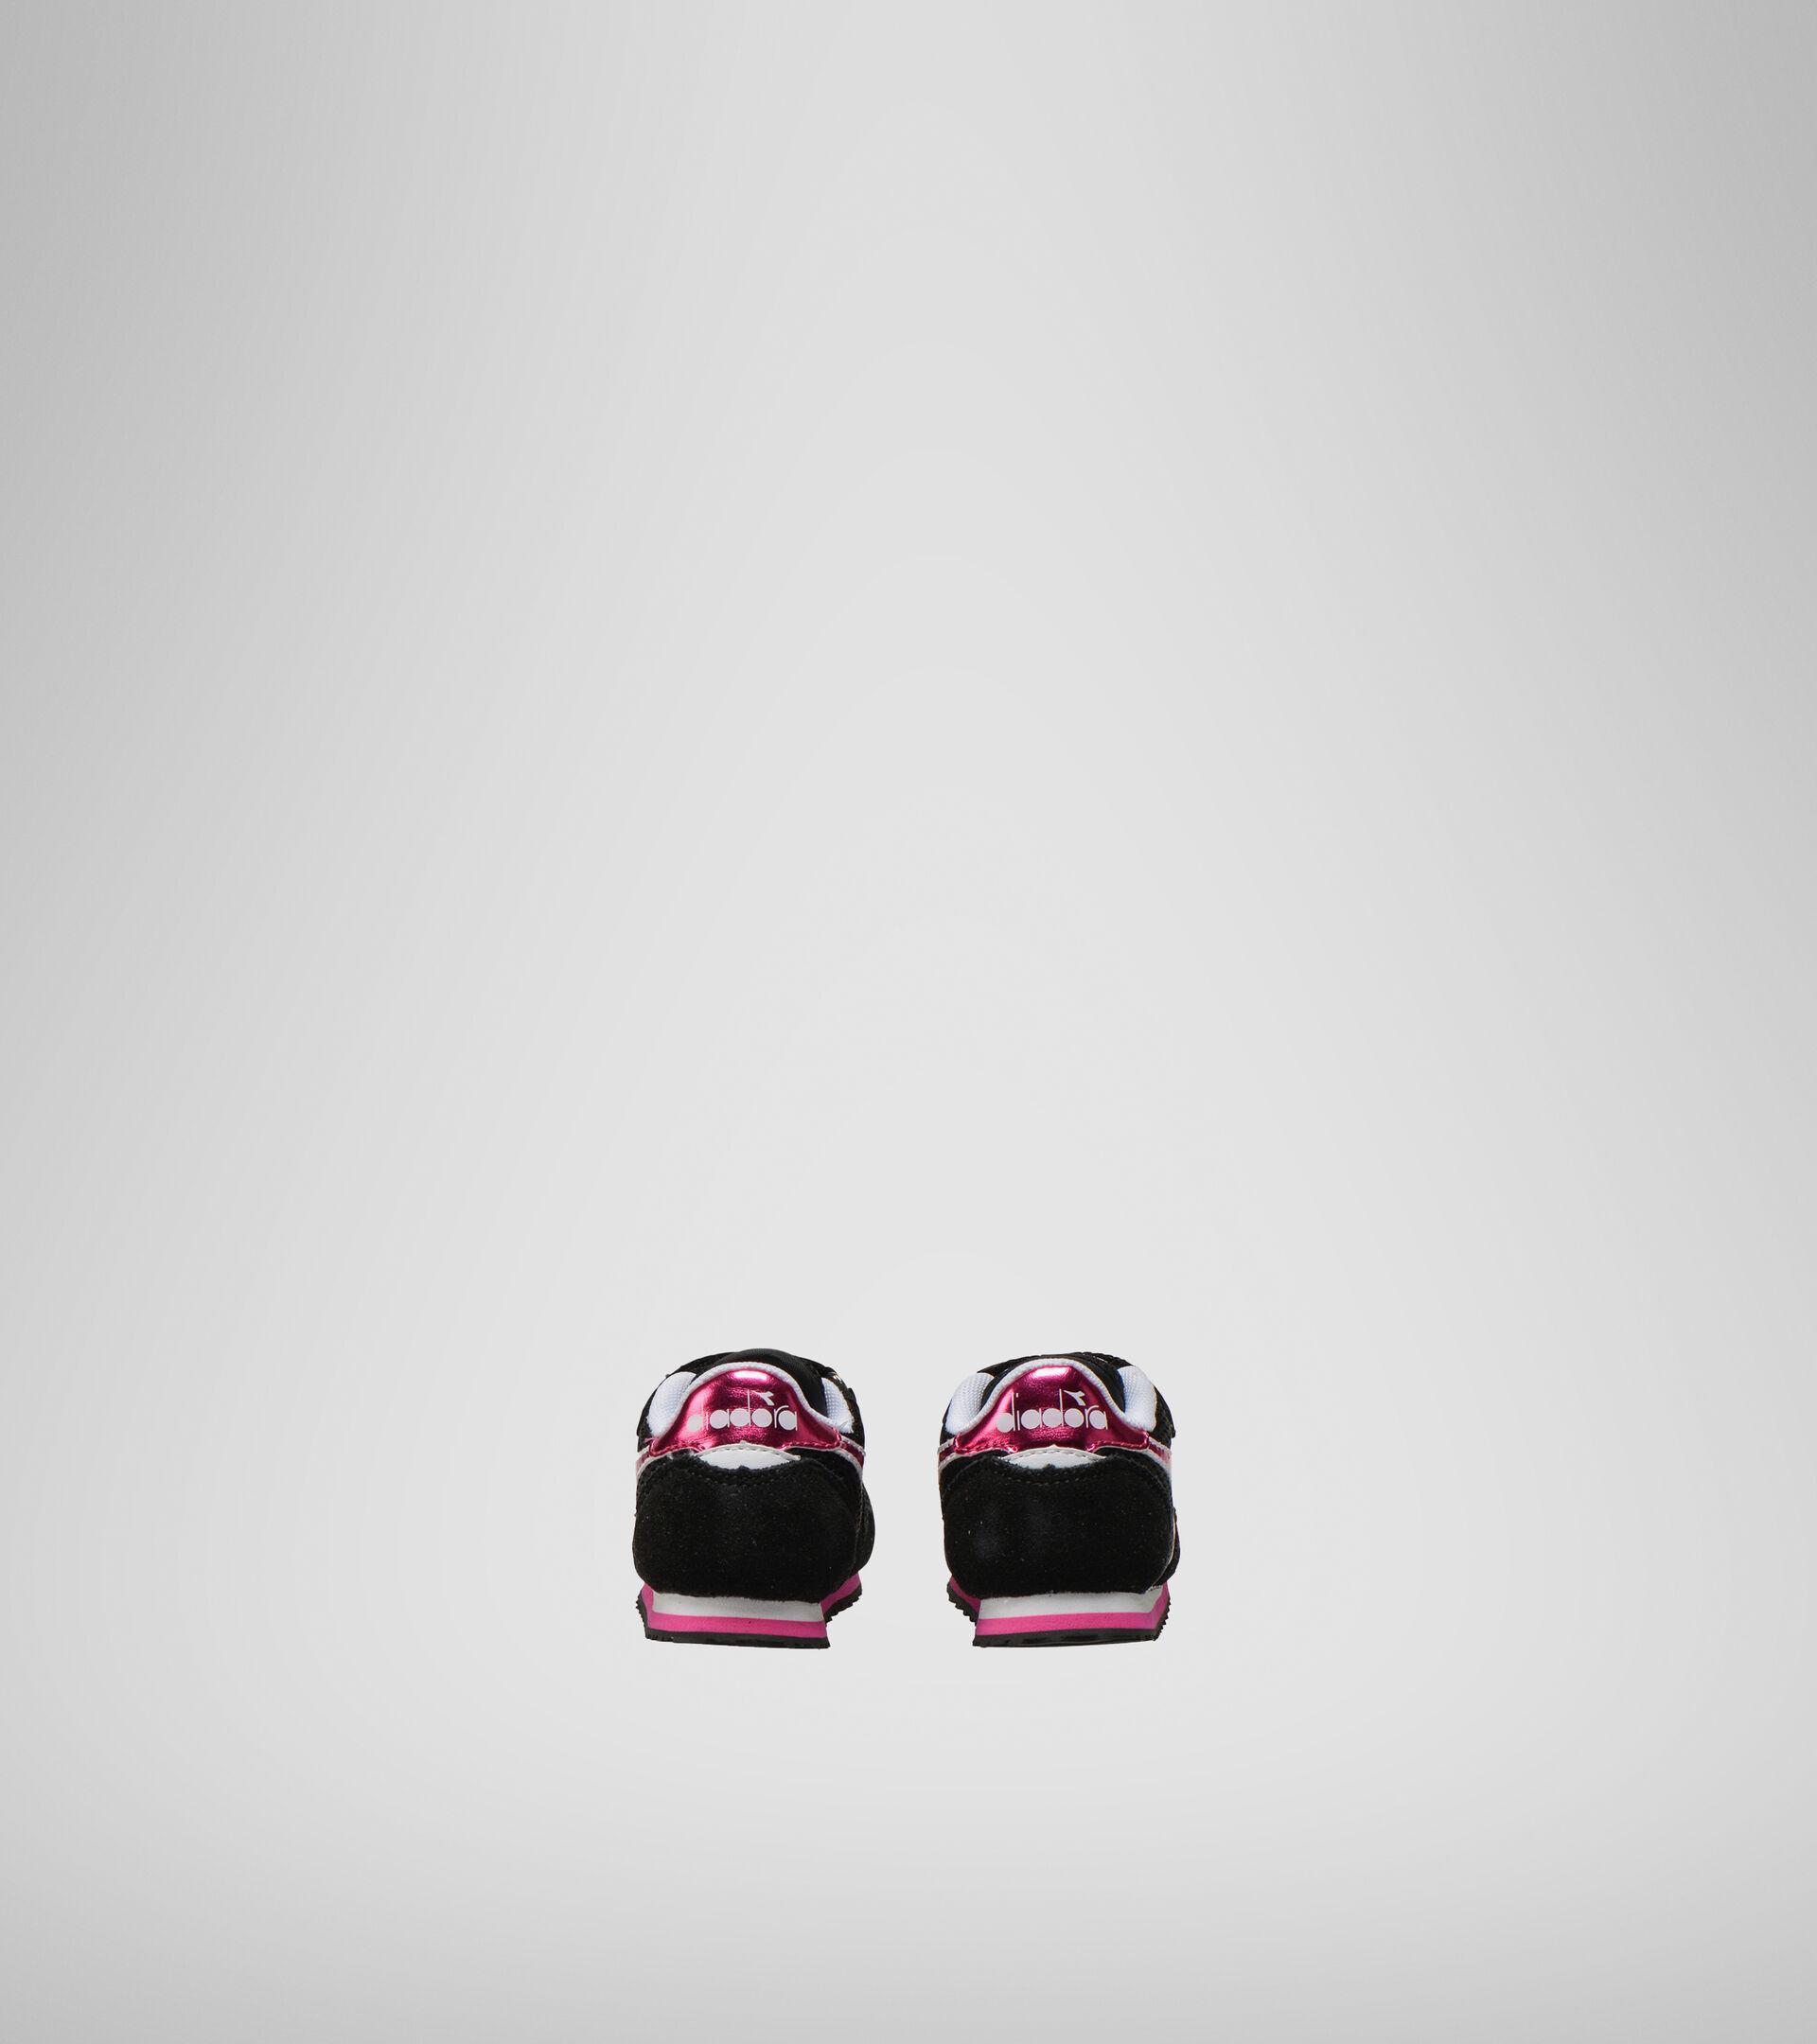 Sports shoes - Toddlers 1-4 years SIMPLE RUN TD GIRL BLACK - Diadora